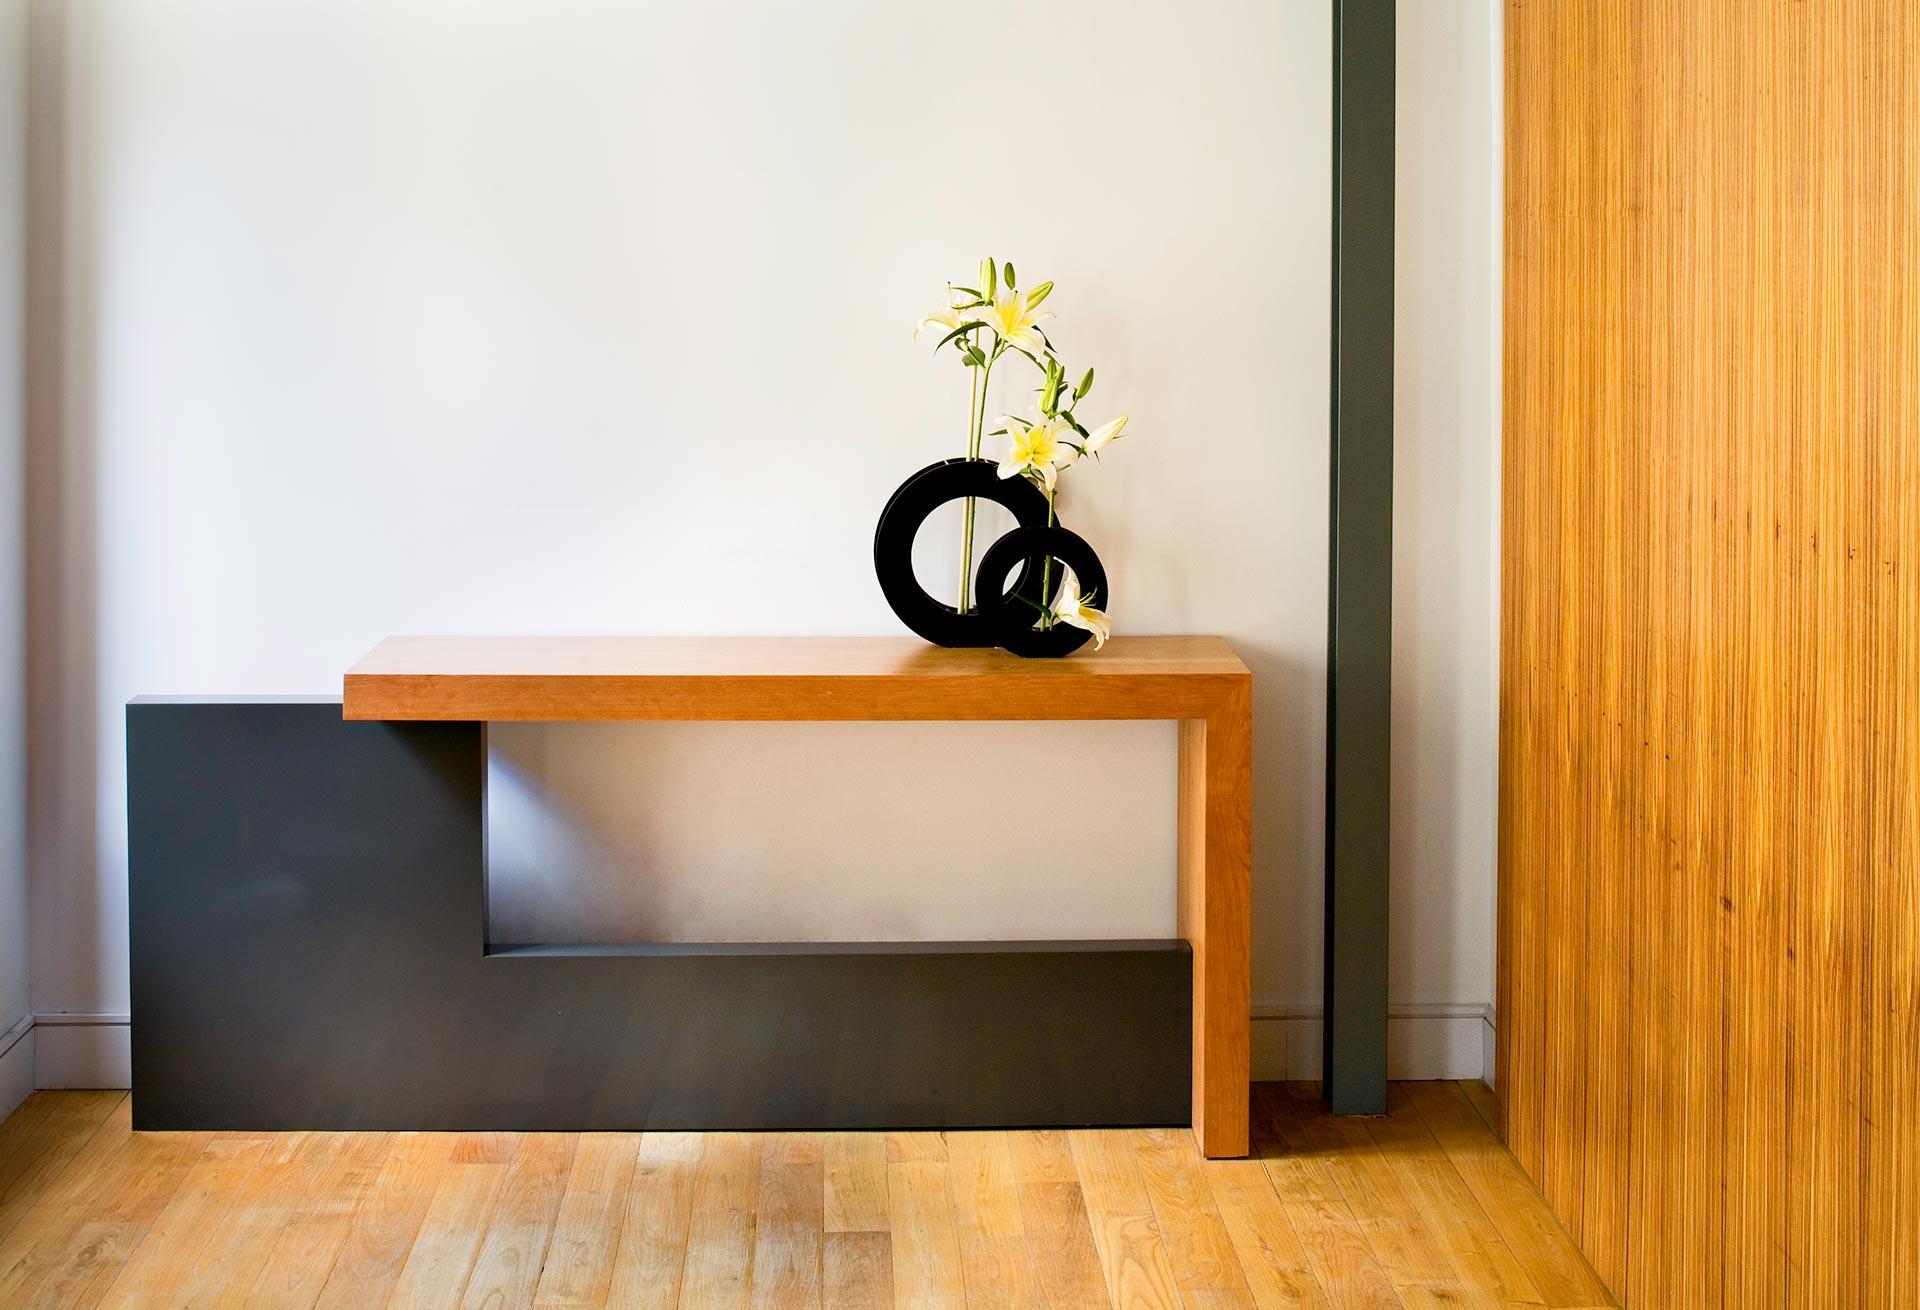 STORIES - A piece of furniture by an interior designer, Inés Benavides.